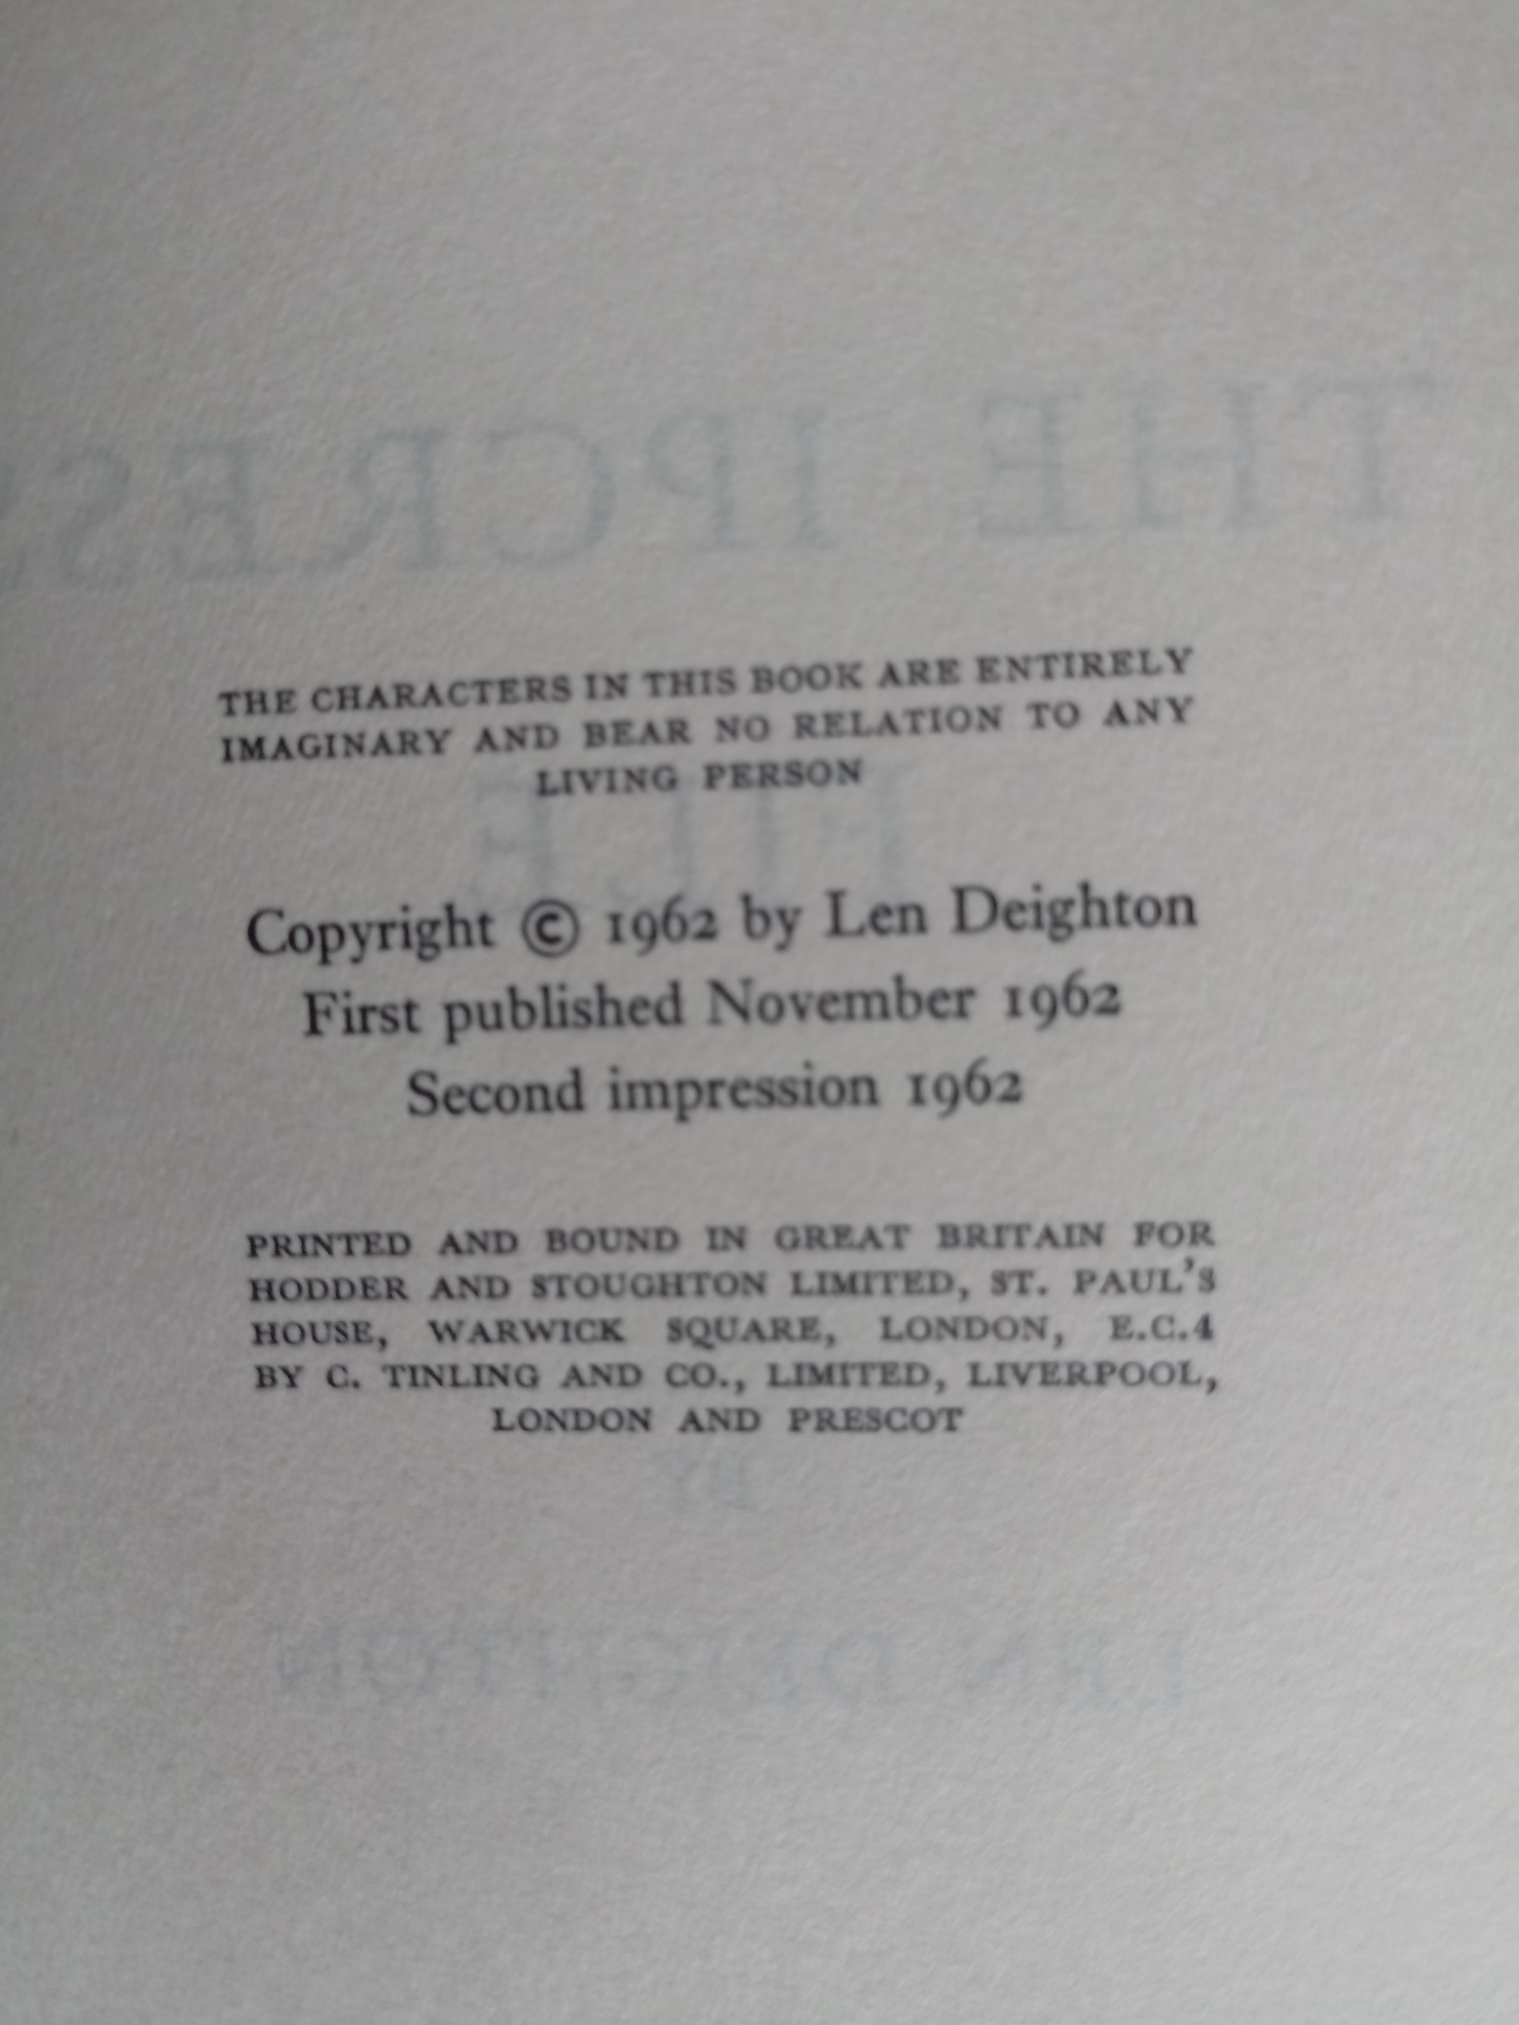 2 x Len Deighton hardback books 1- The Ipcress File Secret File No. 1 223 pages published 1962 - Image 4 of 7